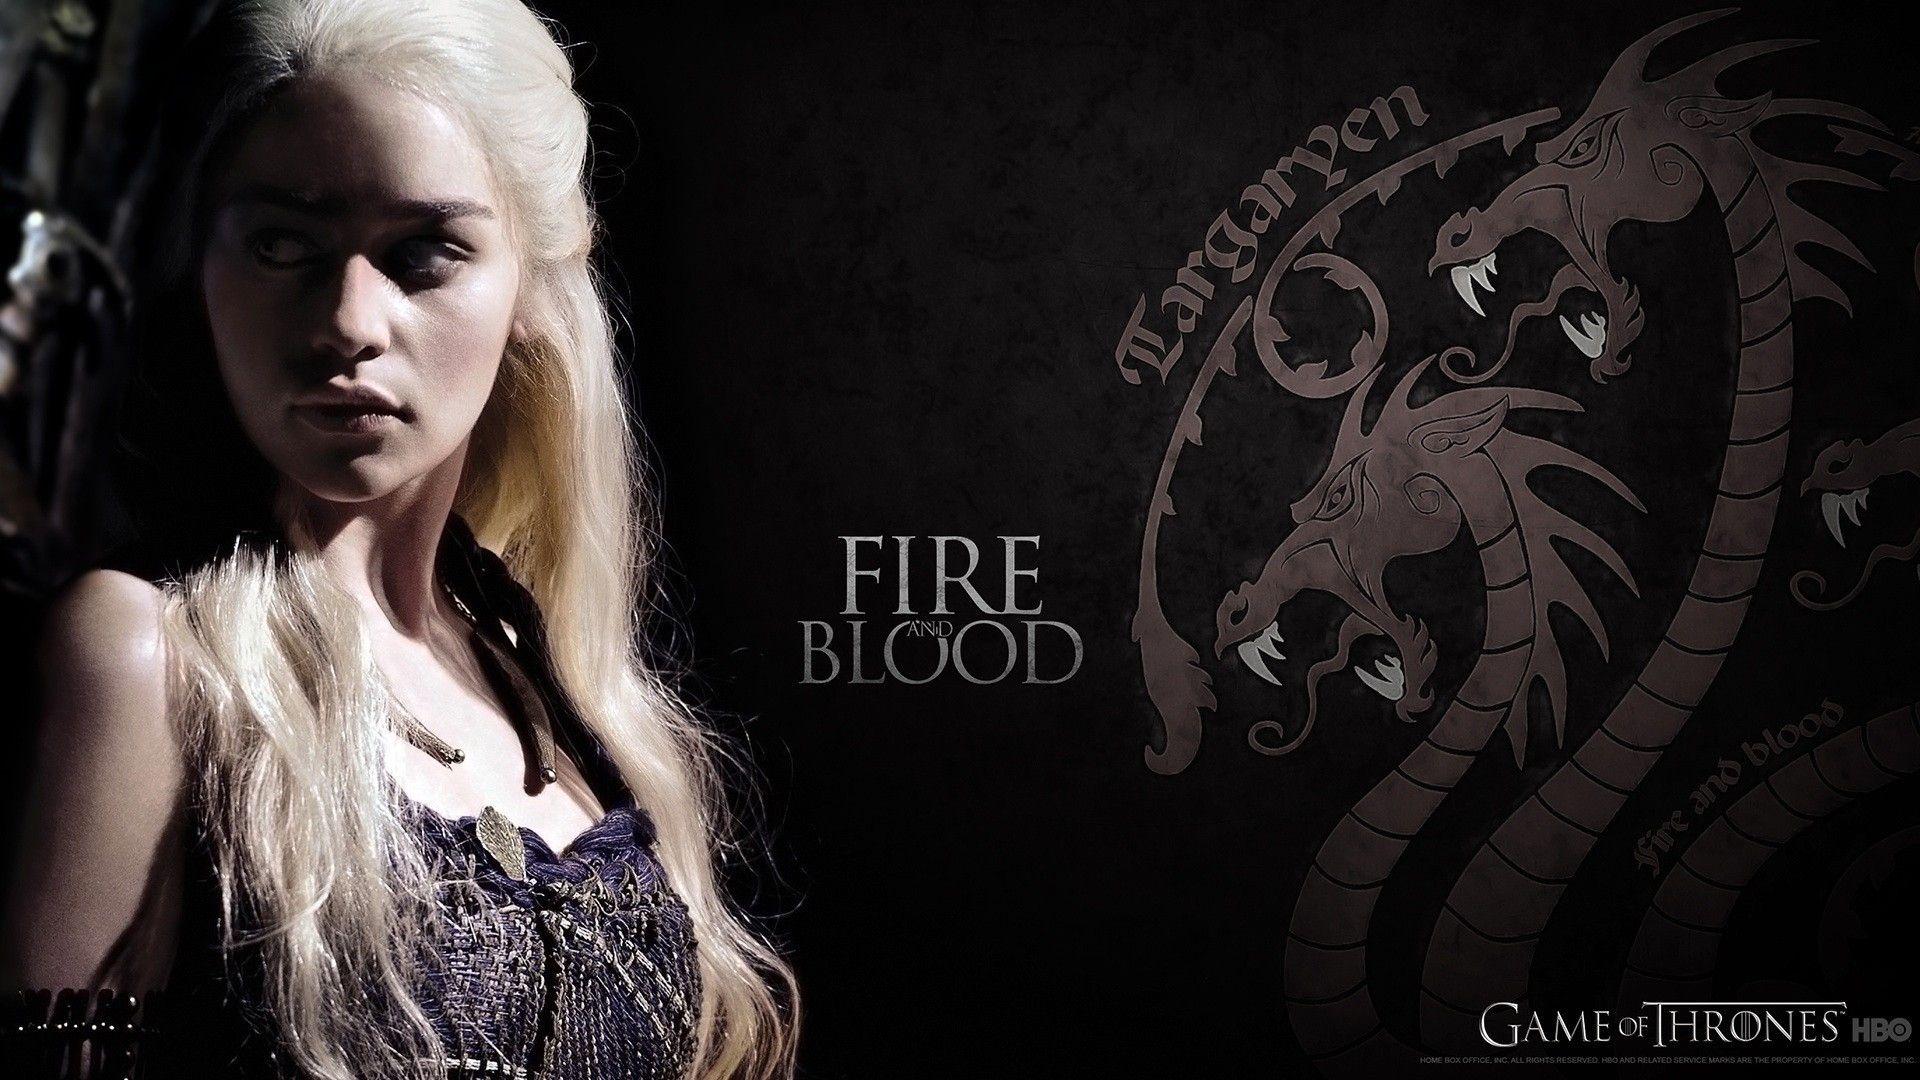 Game of Thrones daenerys hd wallpaper